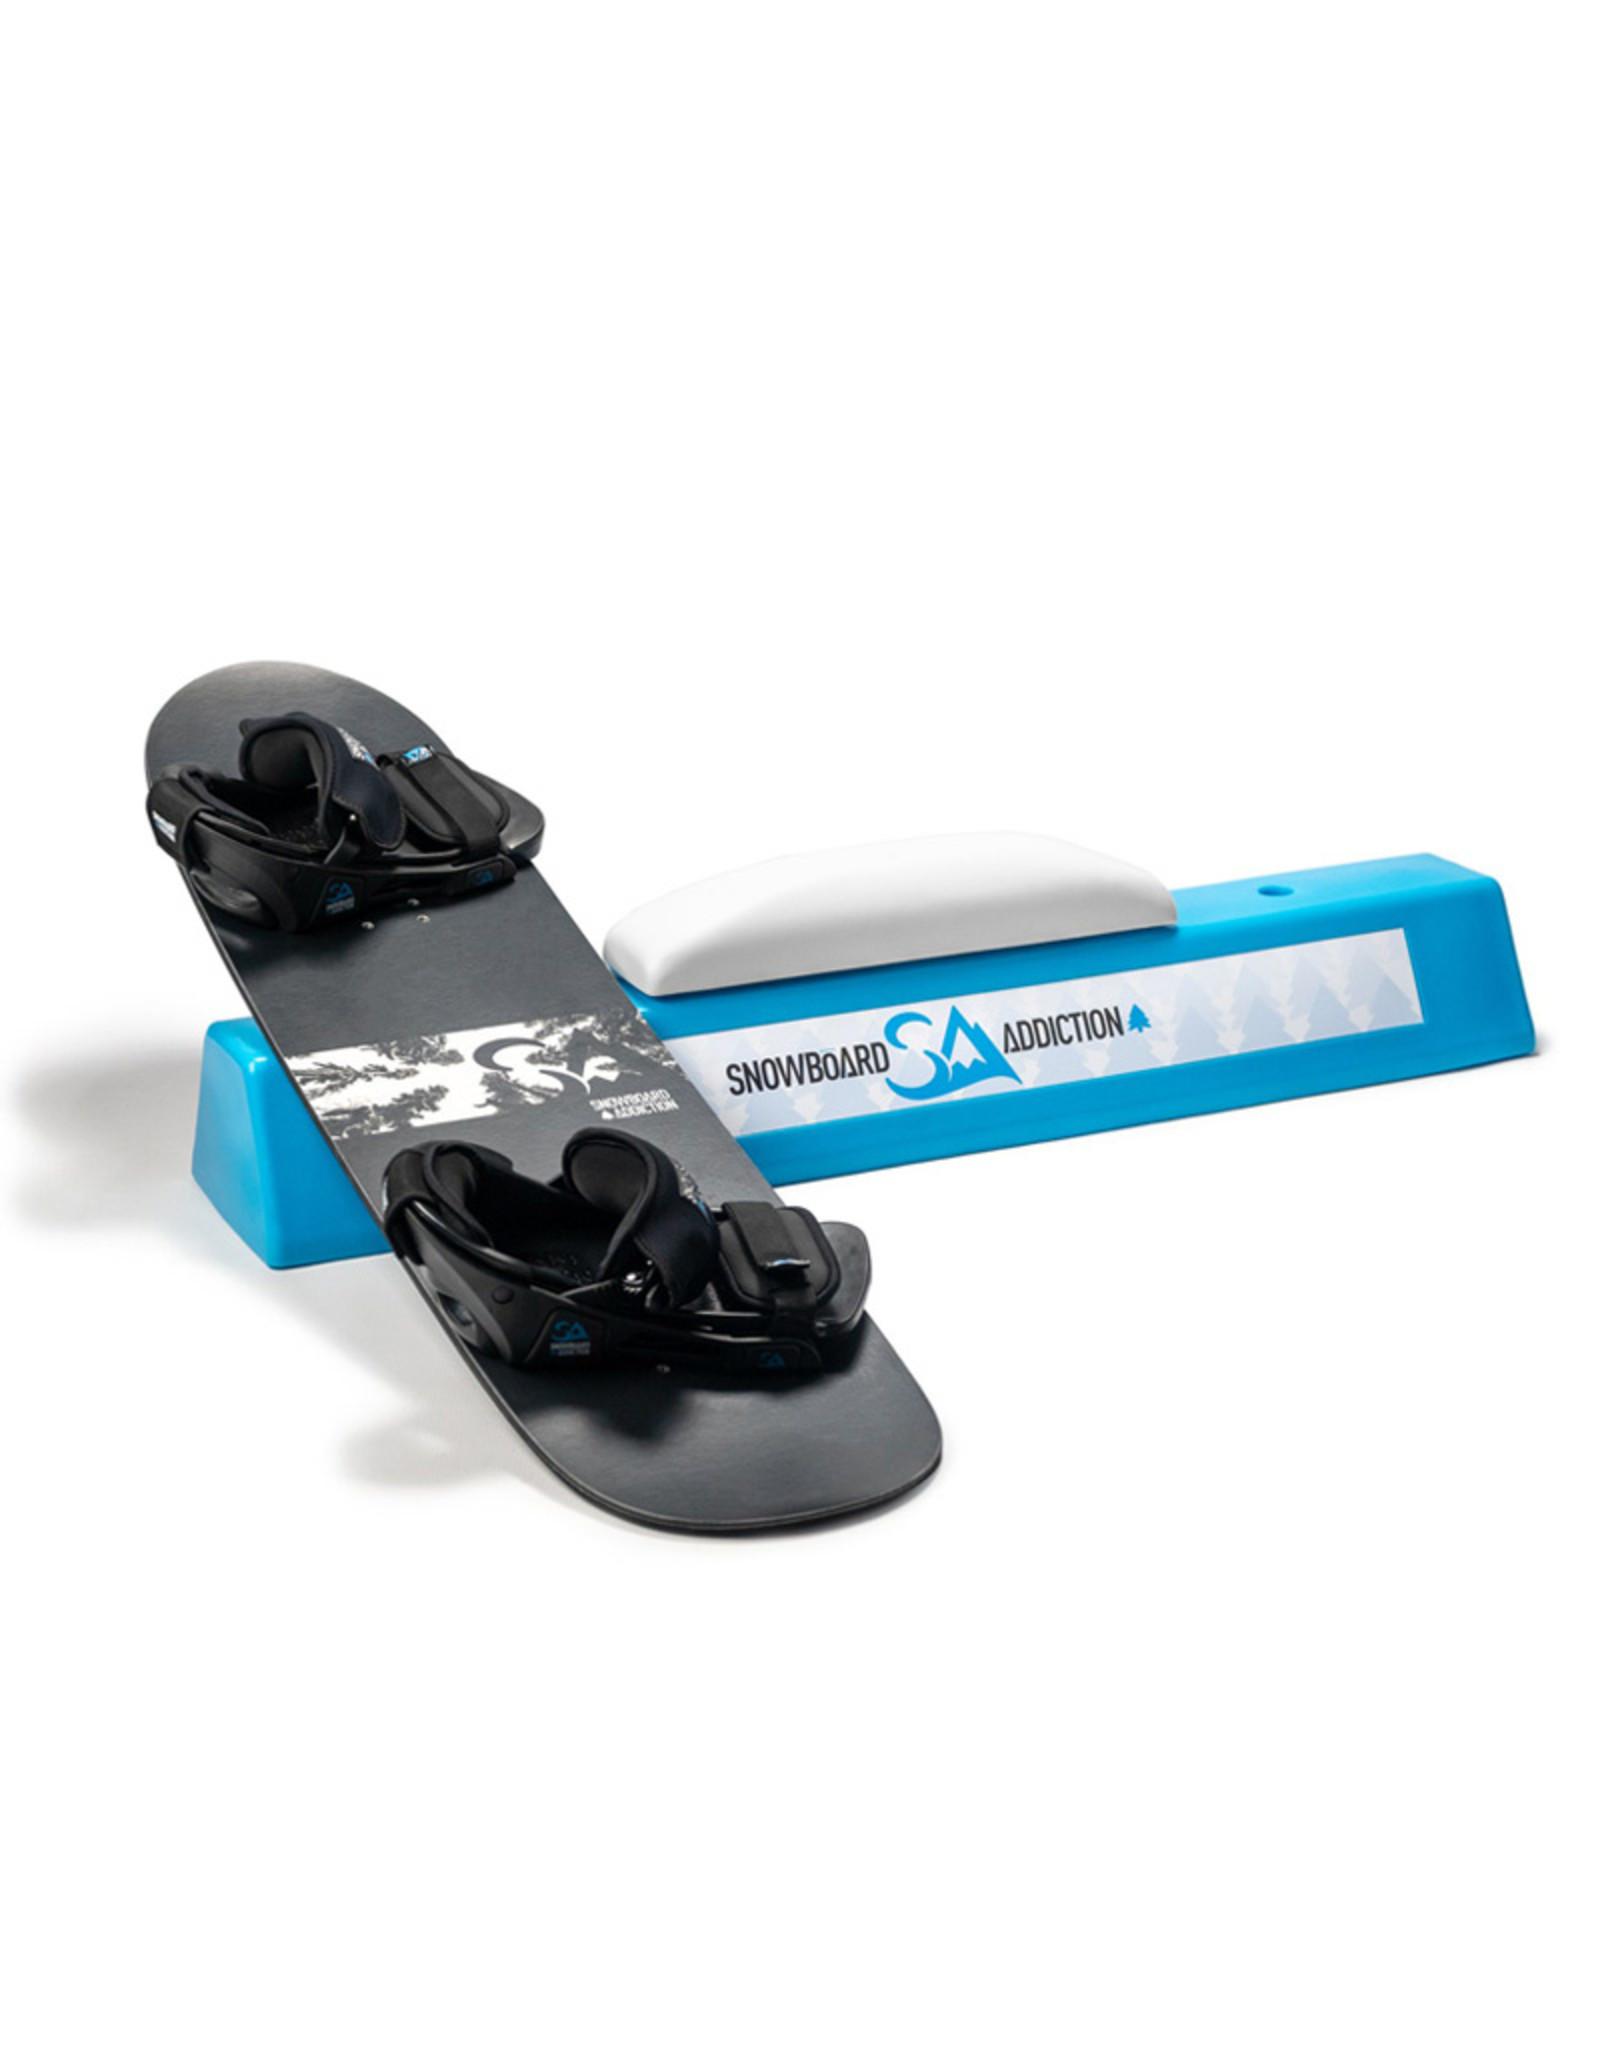 Snowboard Addiction Snowboard Addiction Freestyle Training Setup